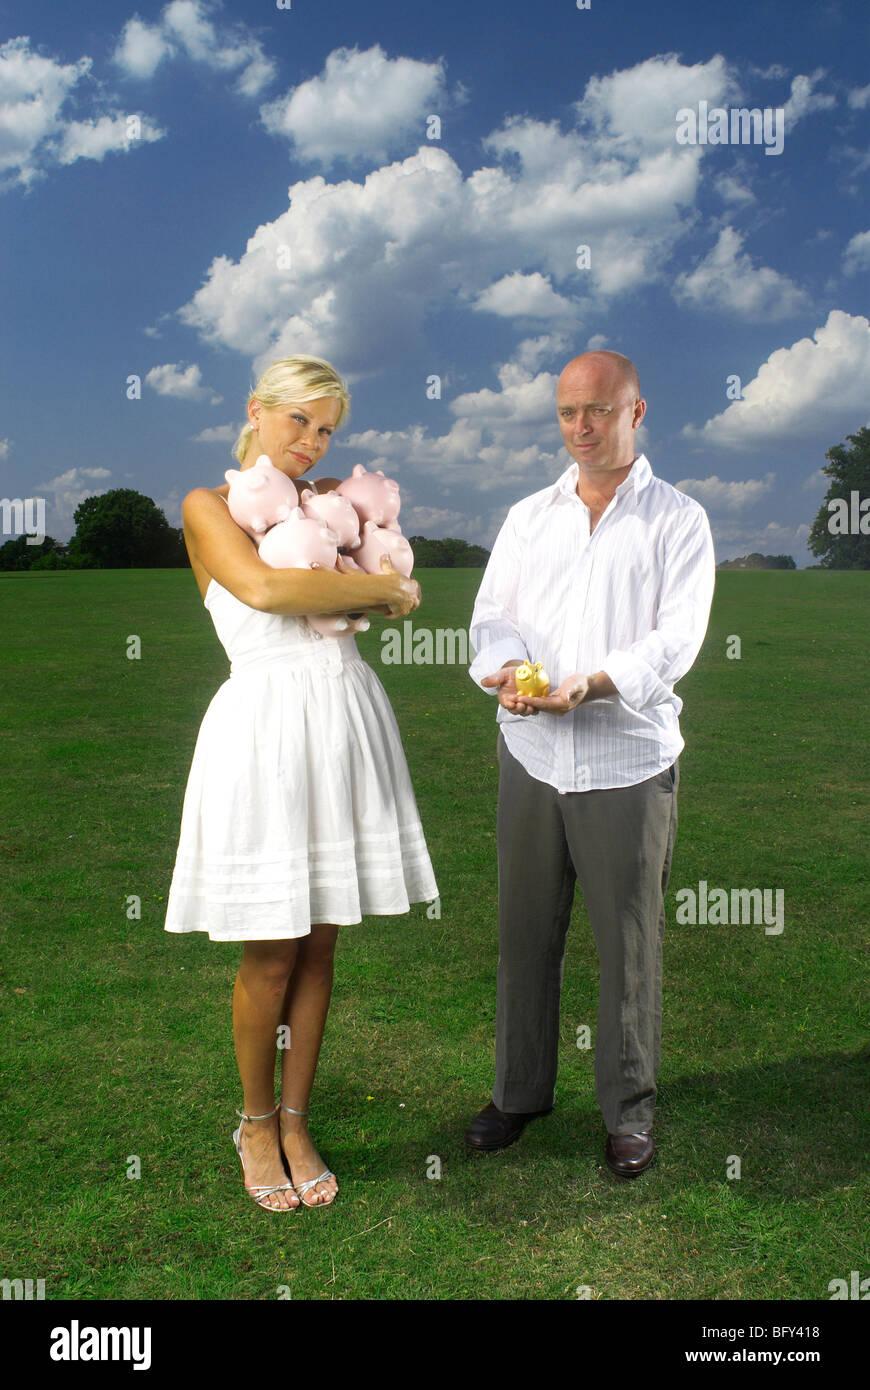 couple holding piggy banks - Stock Image